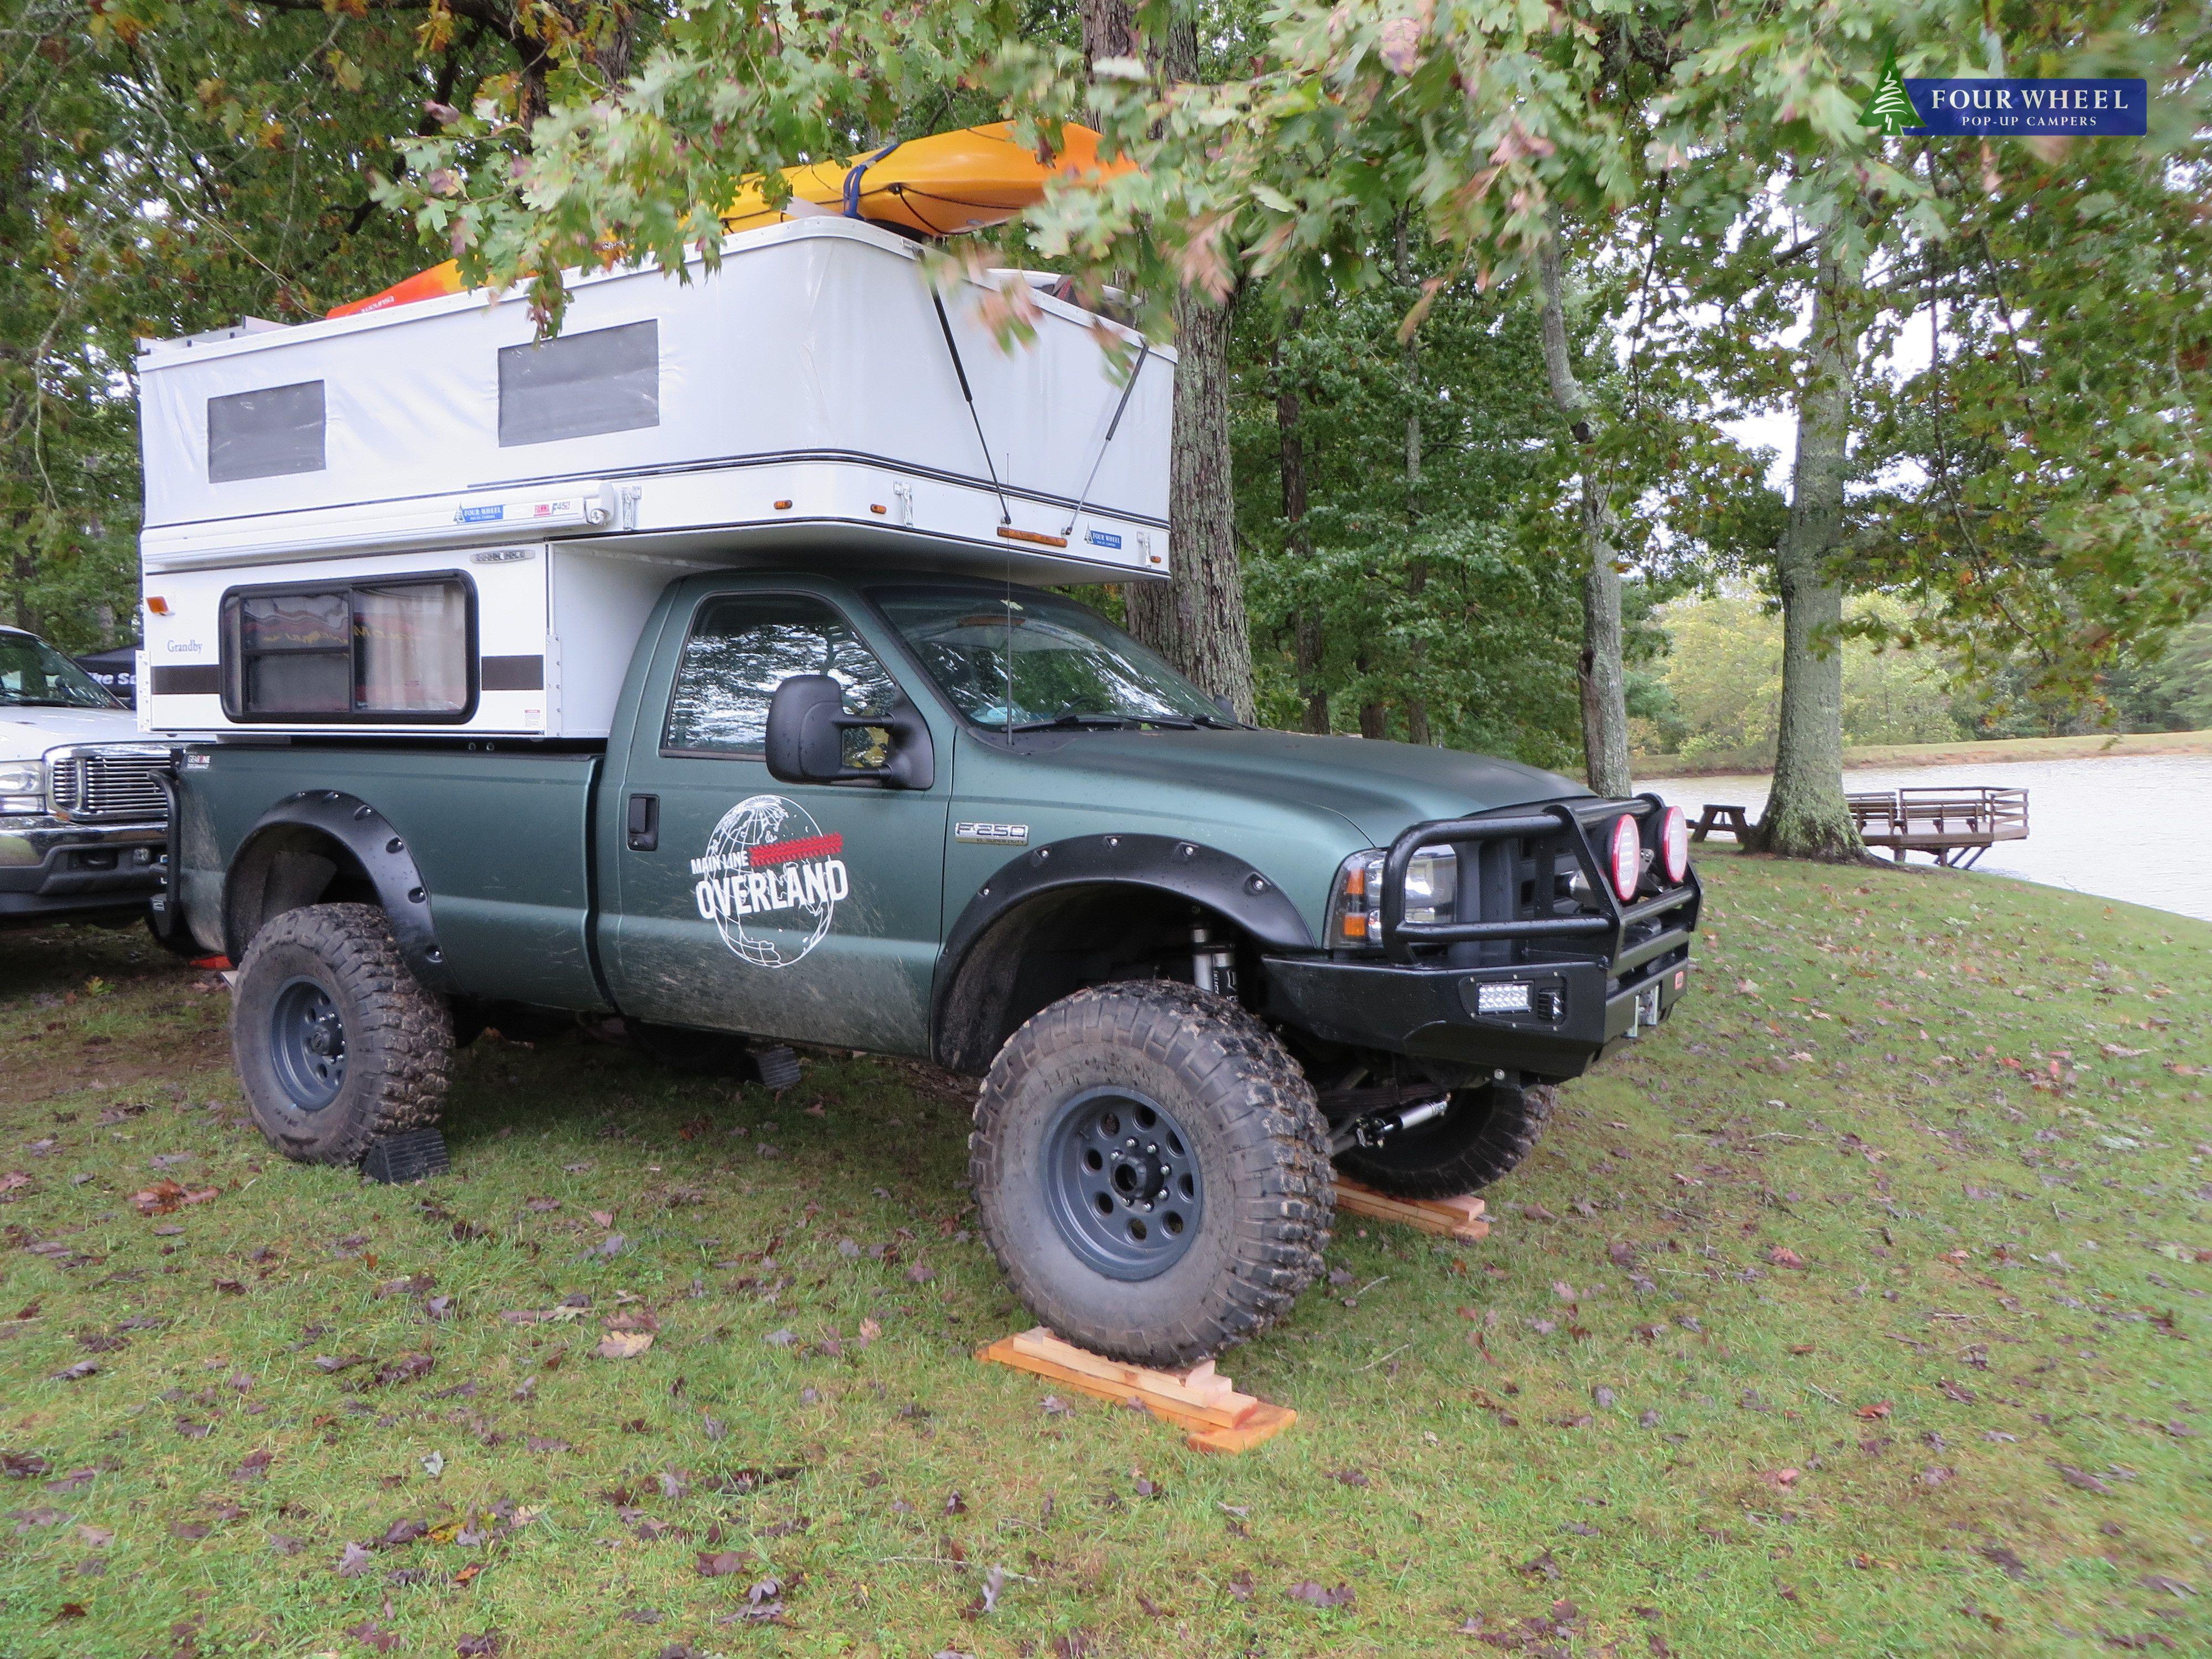 Truck Camper With A Slide In Four Wheel Camper Overland